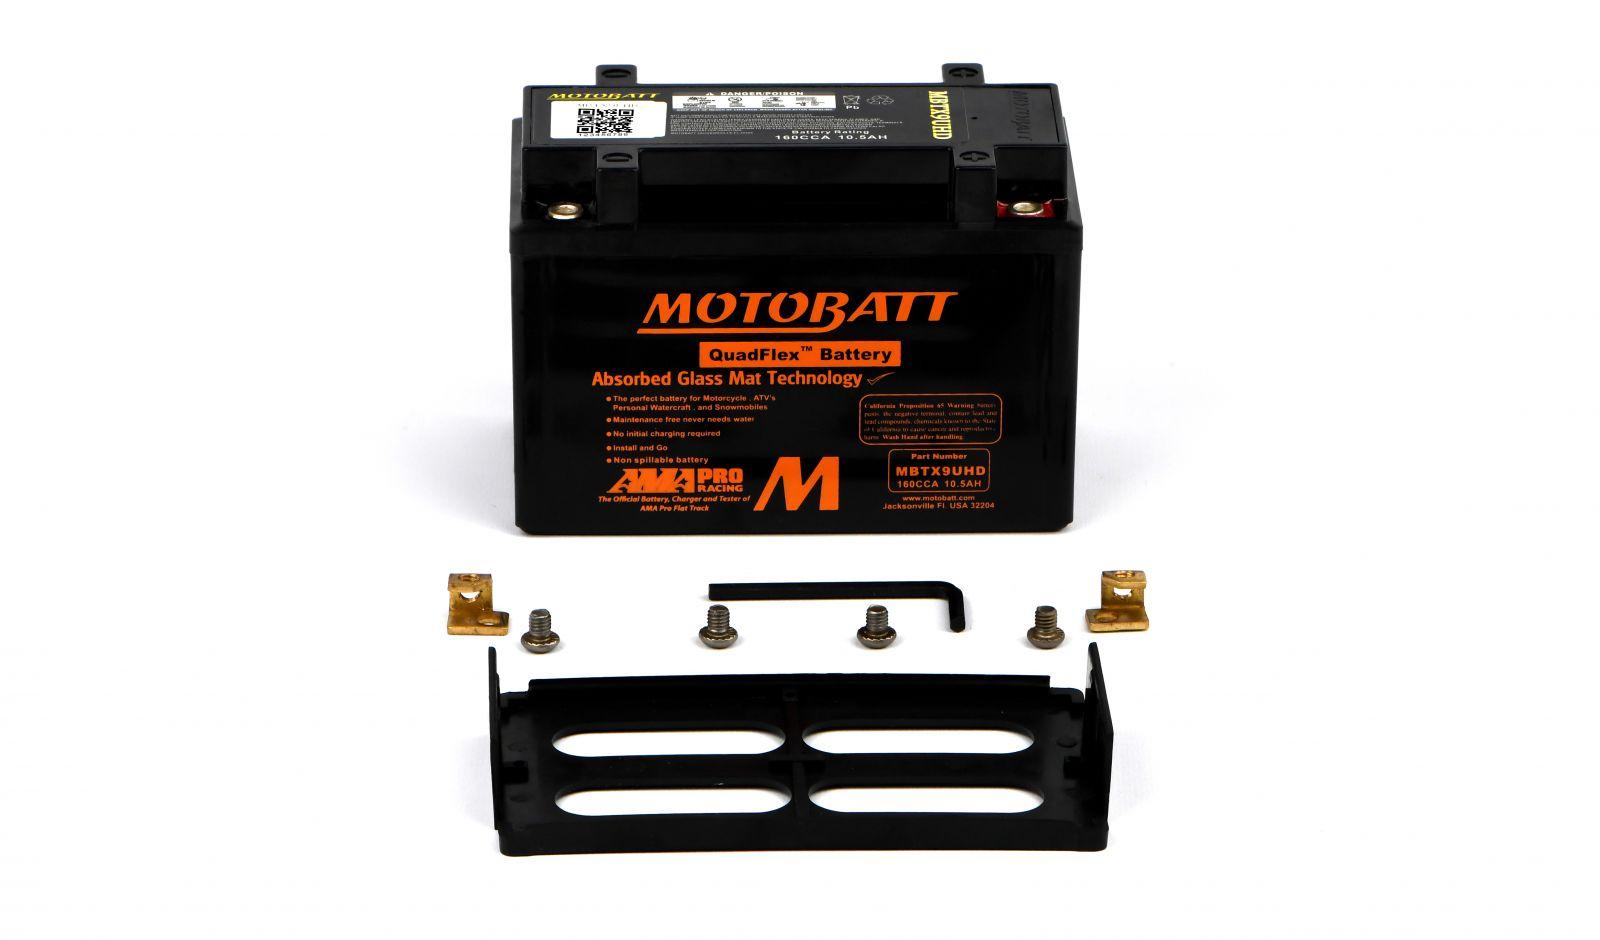 Motobatt Batteries - 501095MB image